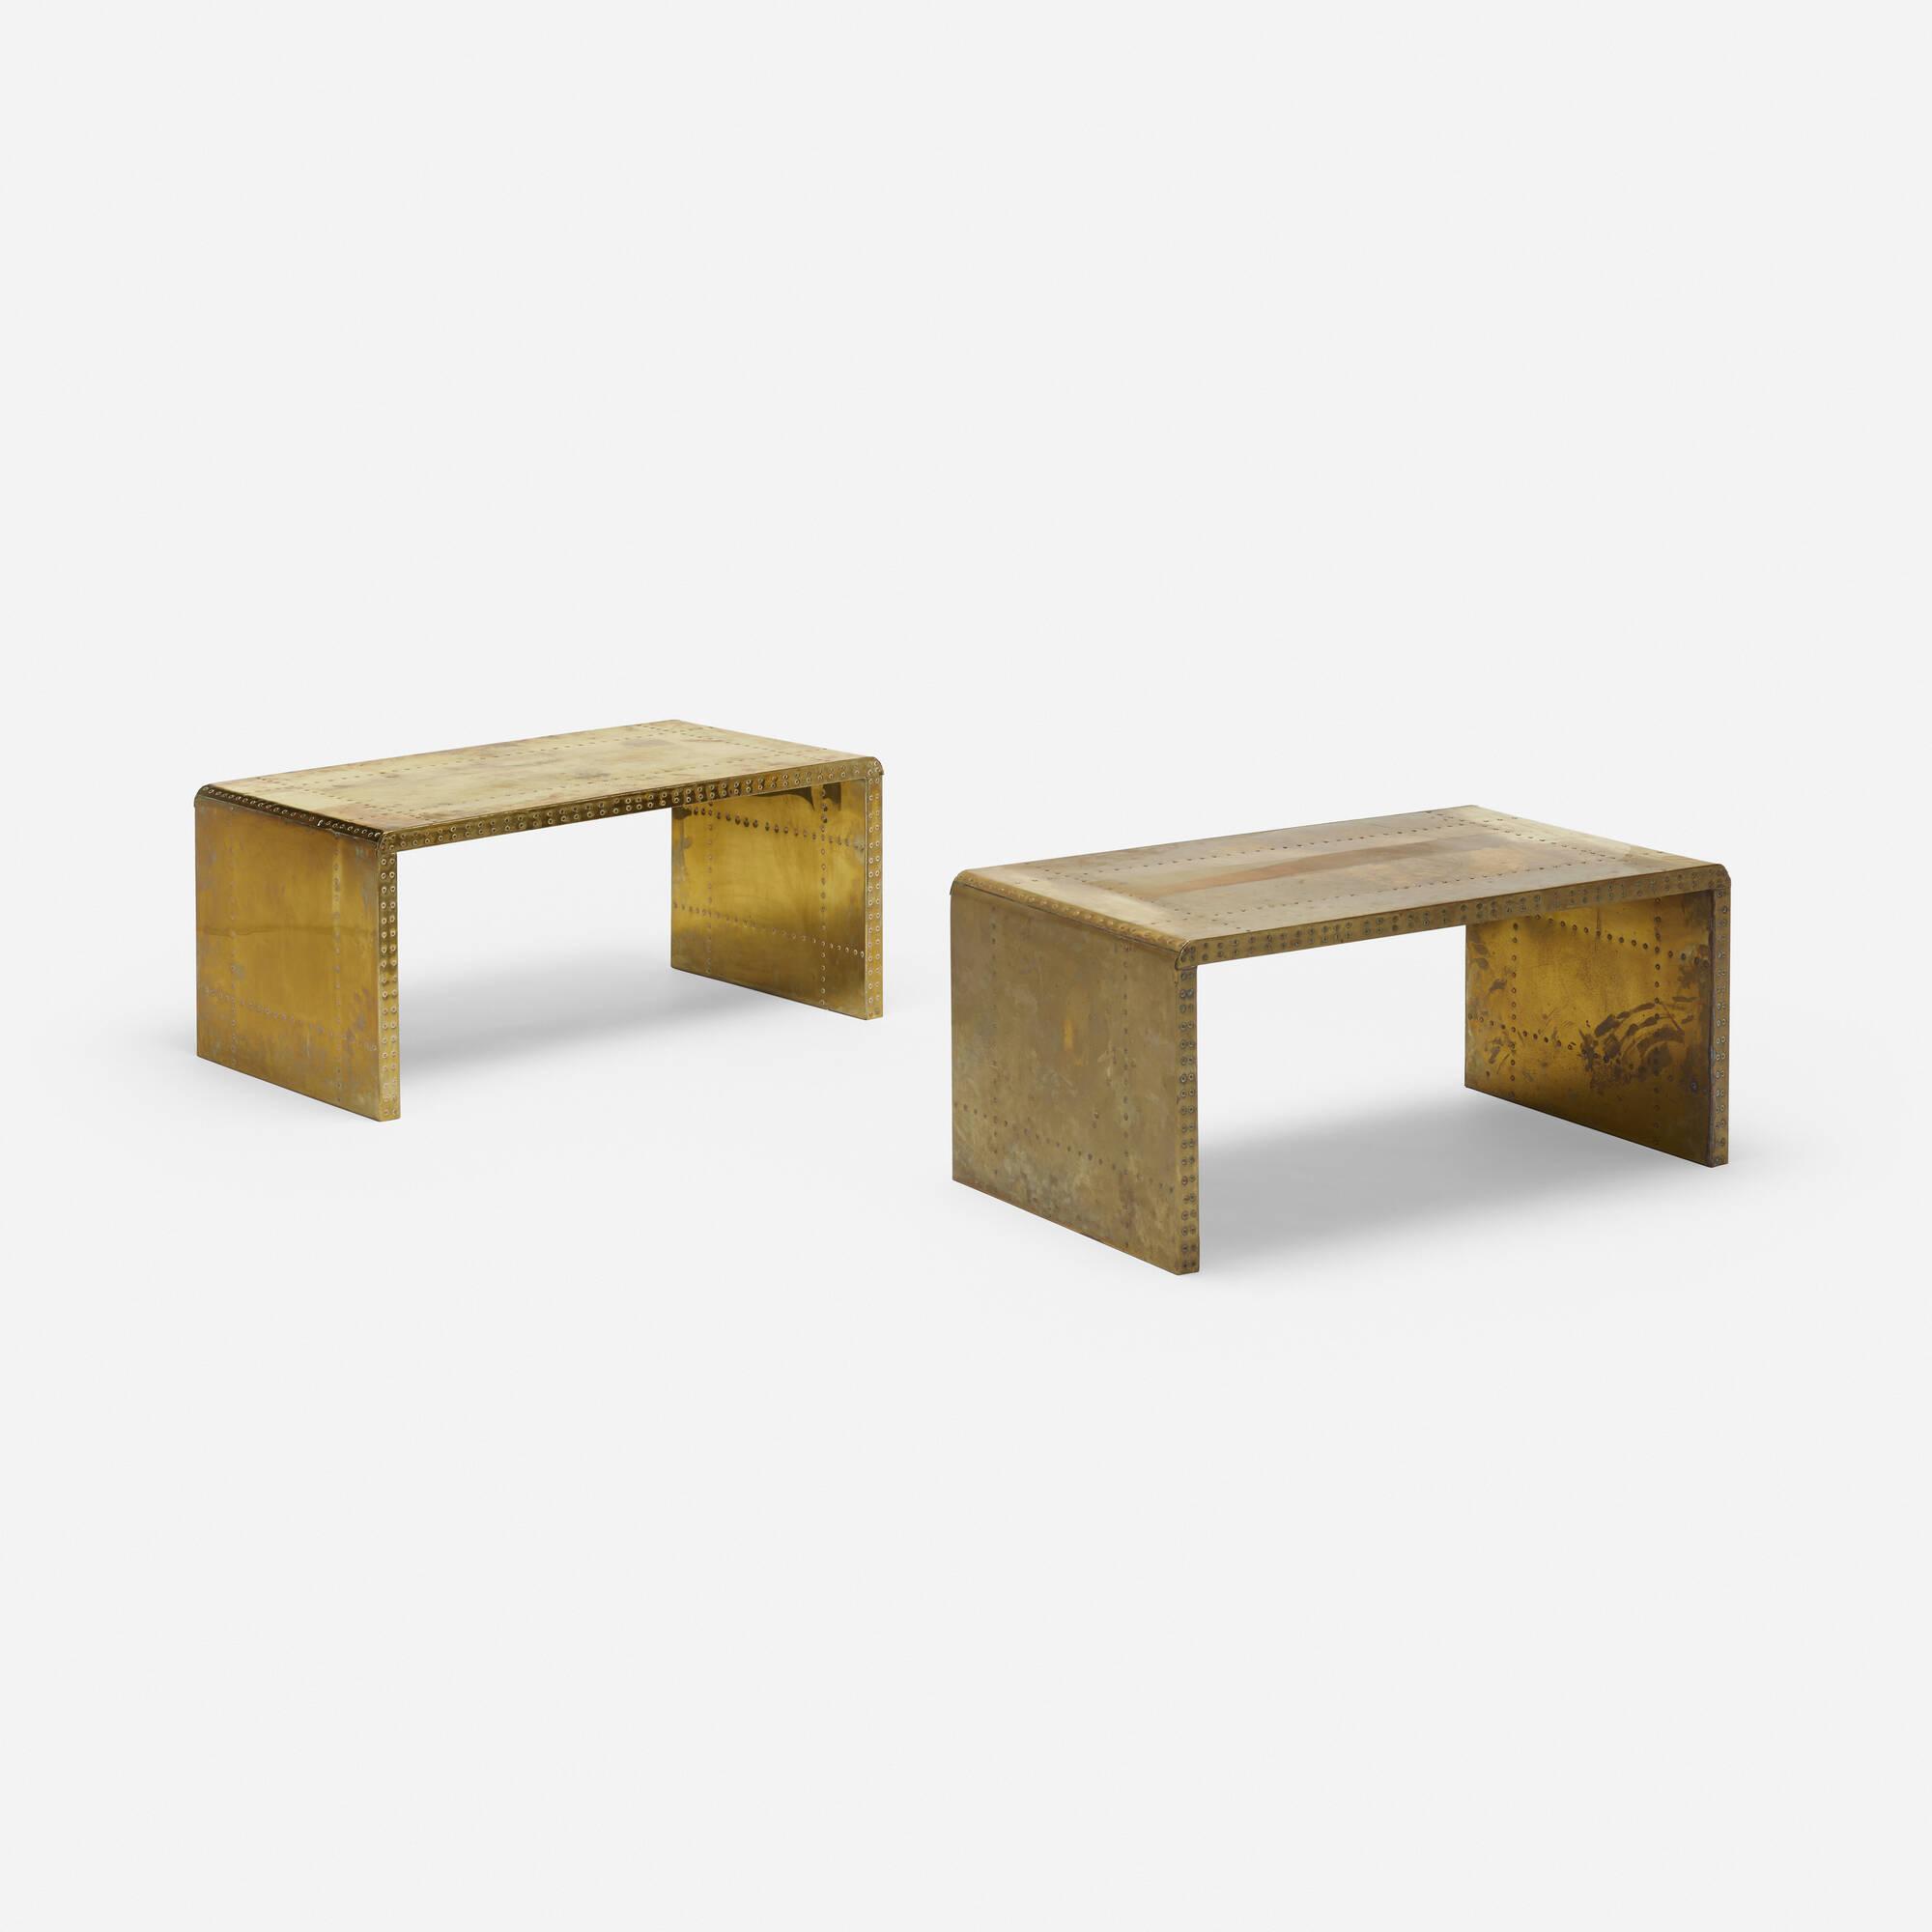 710: Sarreid Ltd. / tables, pair (2 of 3)